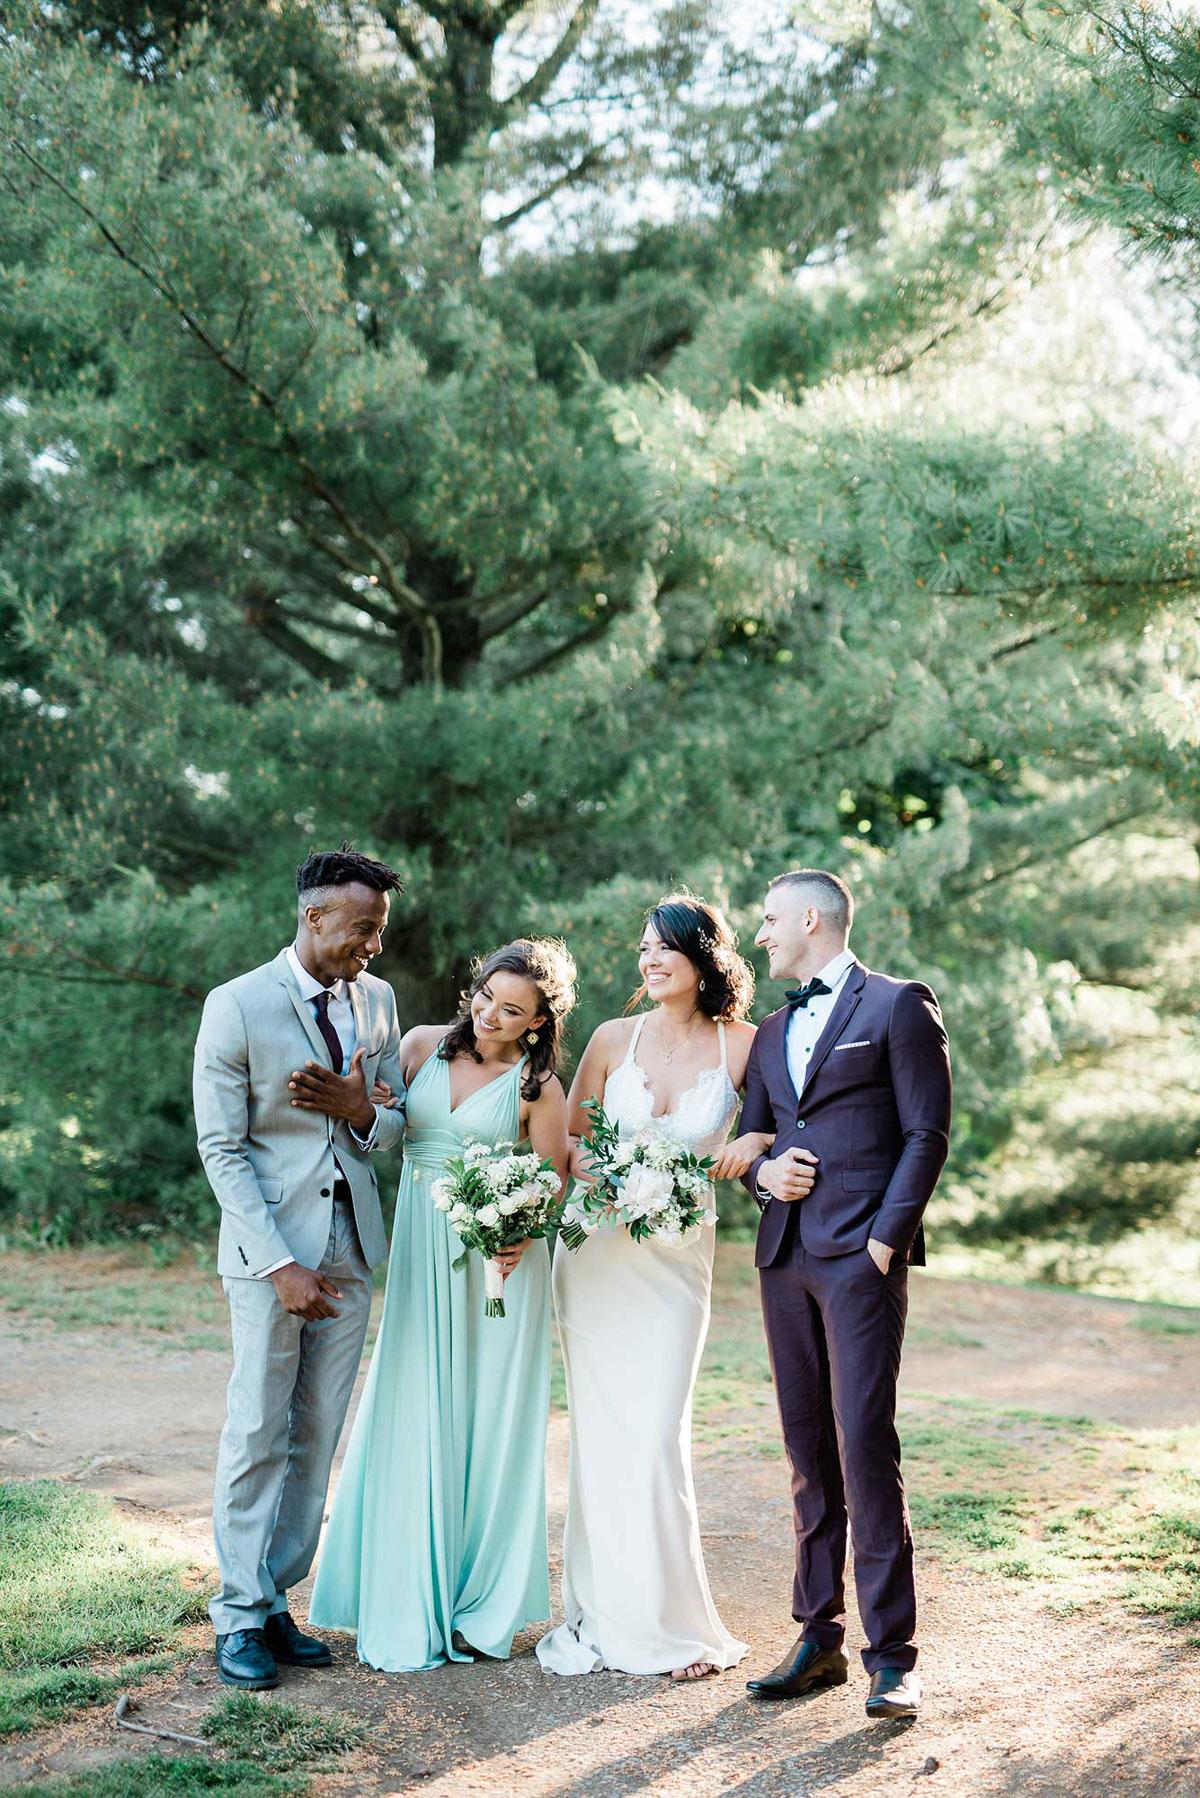 destiny-dawn-photography-vineyard-bride-swish-list-knollwood-golf-and-country-club-ancaster-wedding-editorial-25.jpg